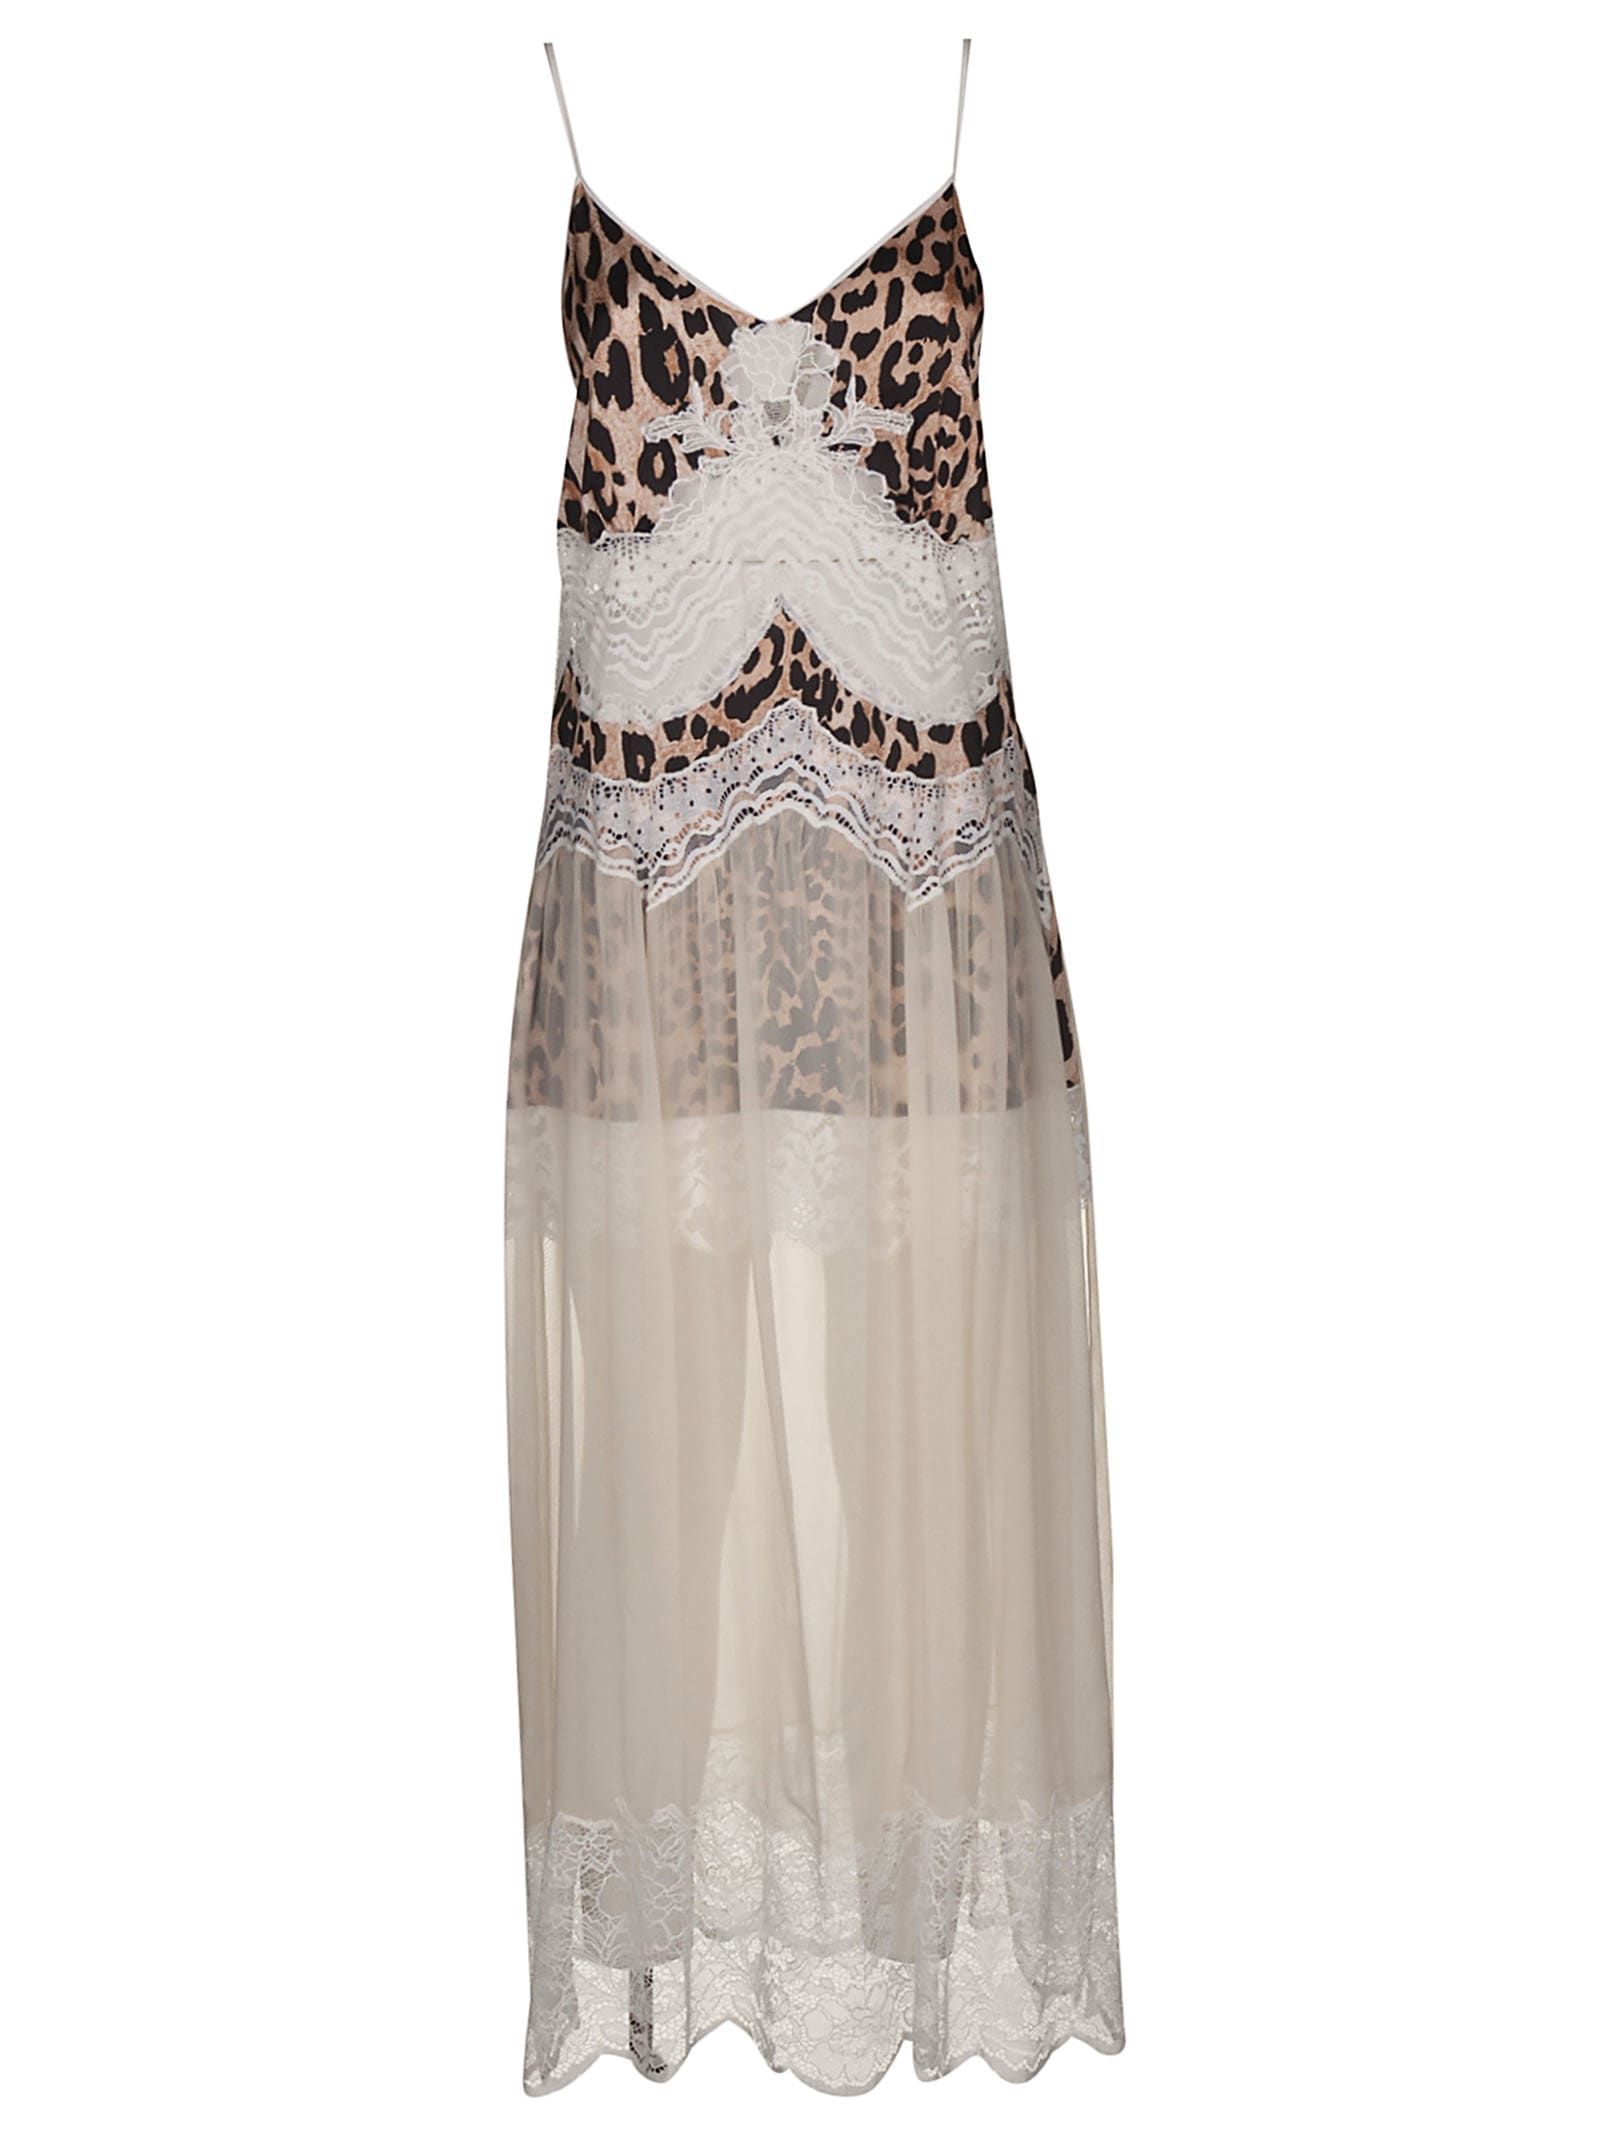 Paco Rabanne Leopard Detail Long Sleeveless Dress